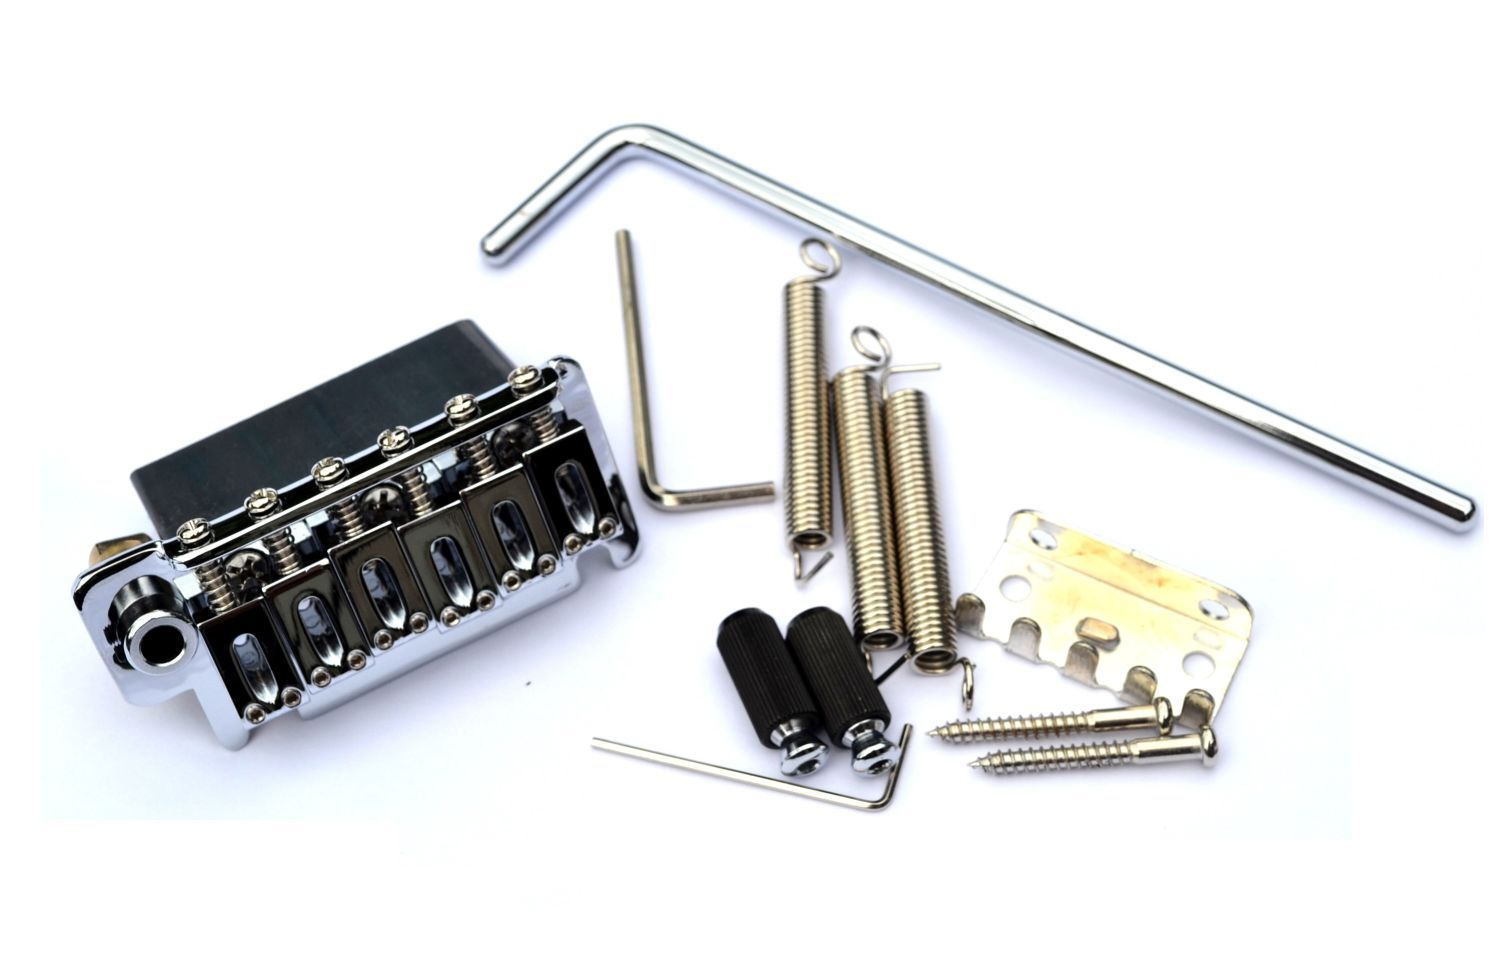 Ponte Cromada estilo Stratocaster para guitarra (Bloco 40mm) - Sung-il (BS084)  - Luthieria Brasil